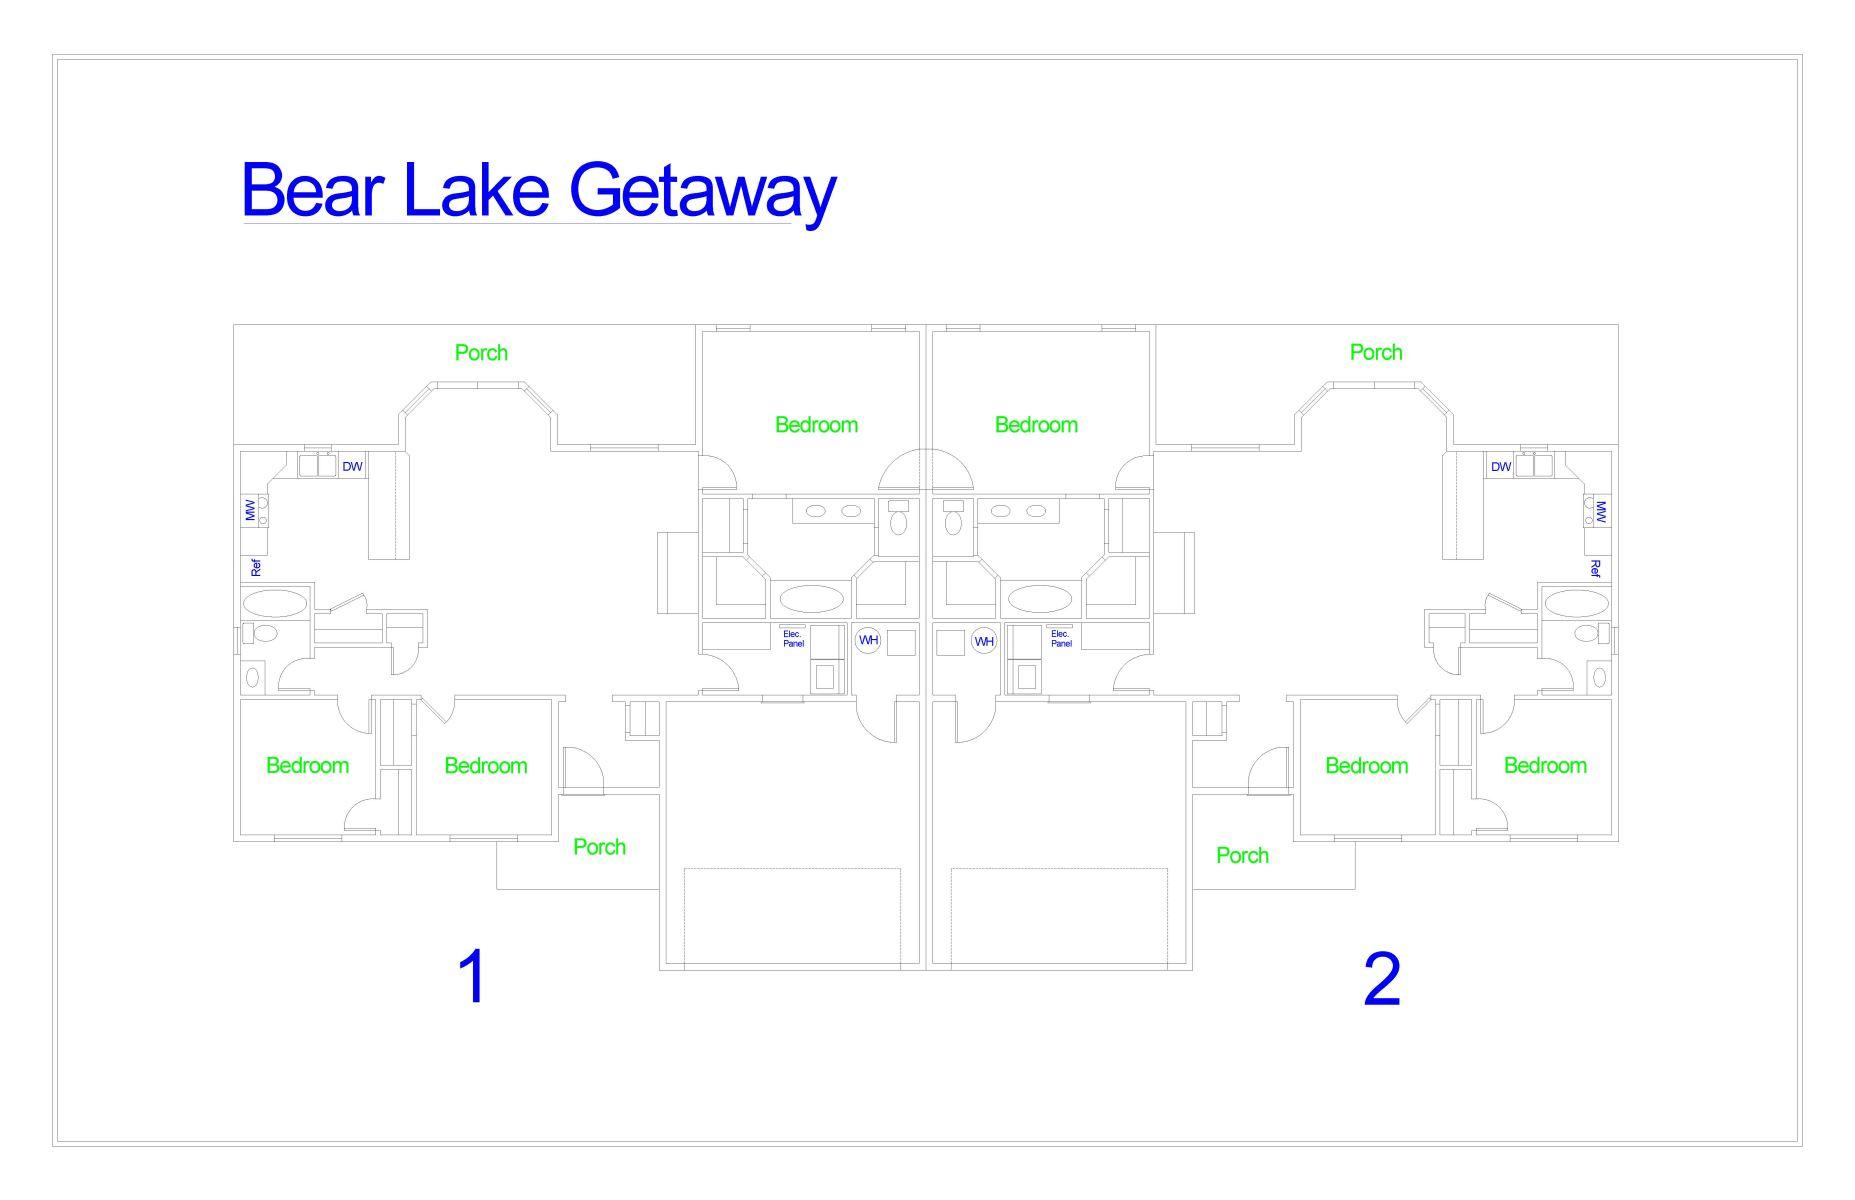 Floor Plan for Bear Lake Getaway #2